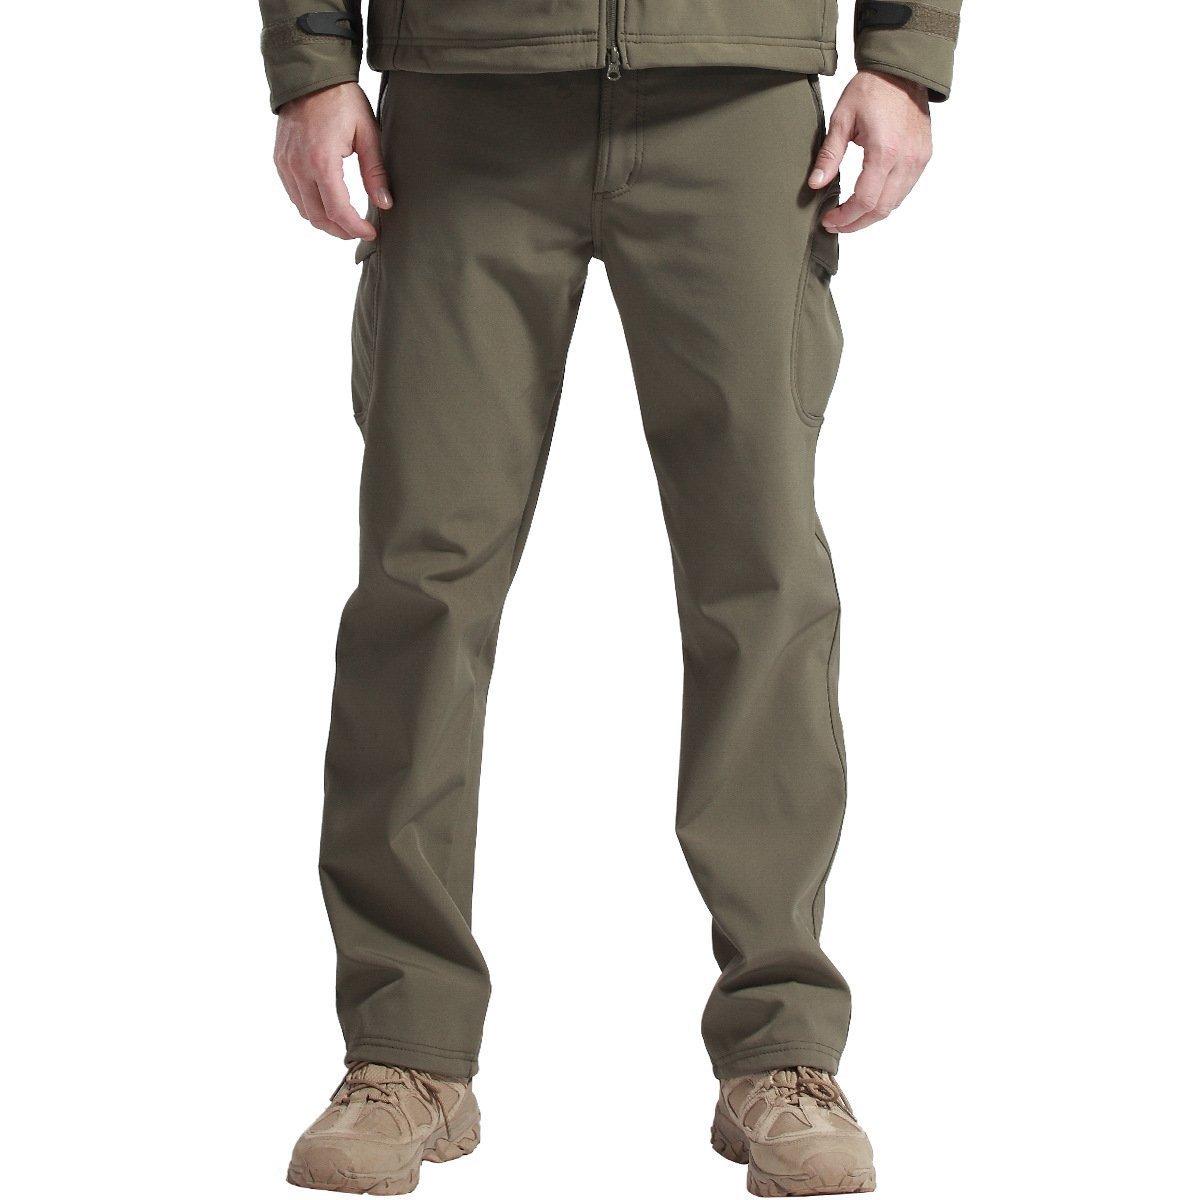 8d8c705485b20 Amazon.com : FREE SOLDIER Men's Outdoor Water Repellent Windproof Softshell  Fleece Lined Cargo Snow Hiking Pants : Clothing